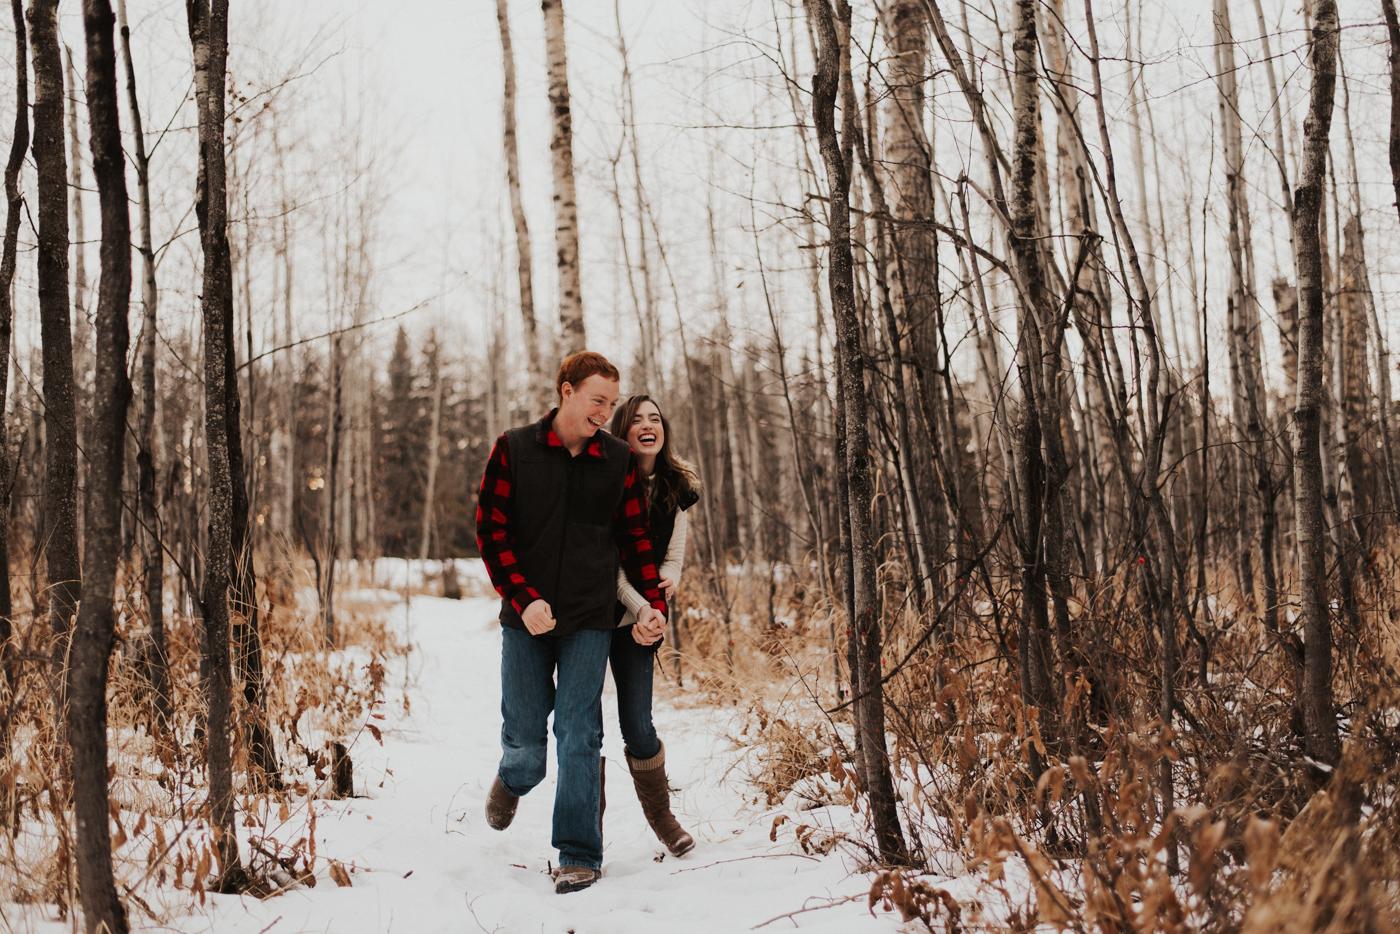 FortSt.John_photographer_TyraEPhotography_Wedding_Couple_Family_Photograhy_DawsonCreek_Elopement_Bride_Boduoir_Portraits-7463.jpg